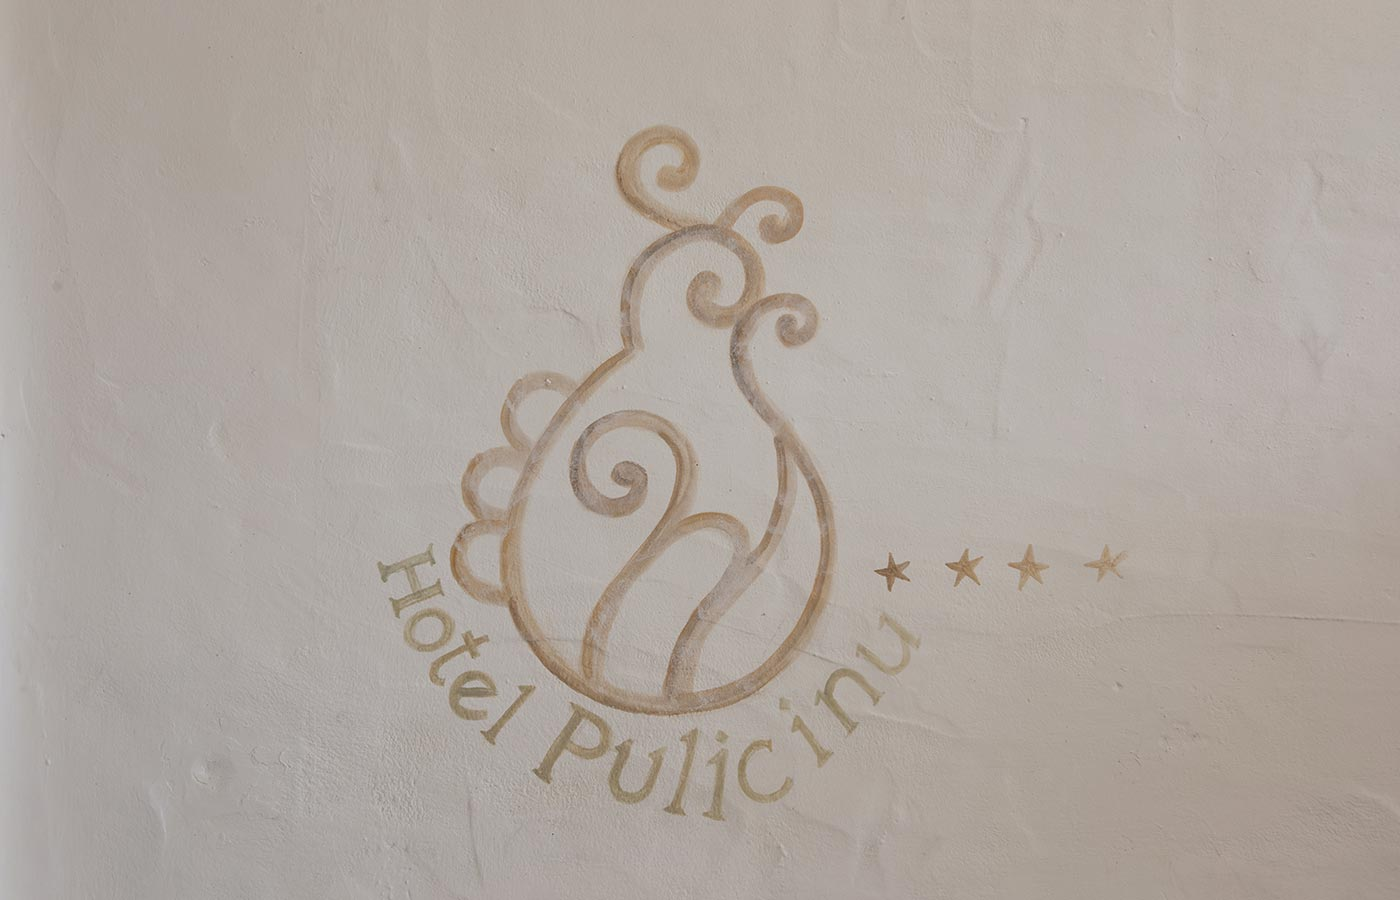 The logo of the Hotel Pulicinu in Baja Sardinia